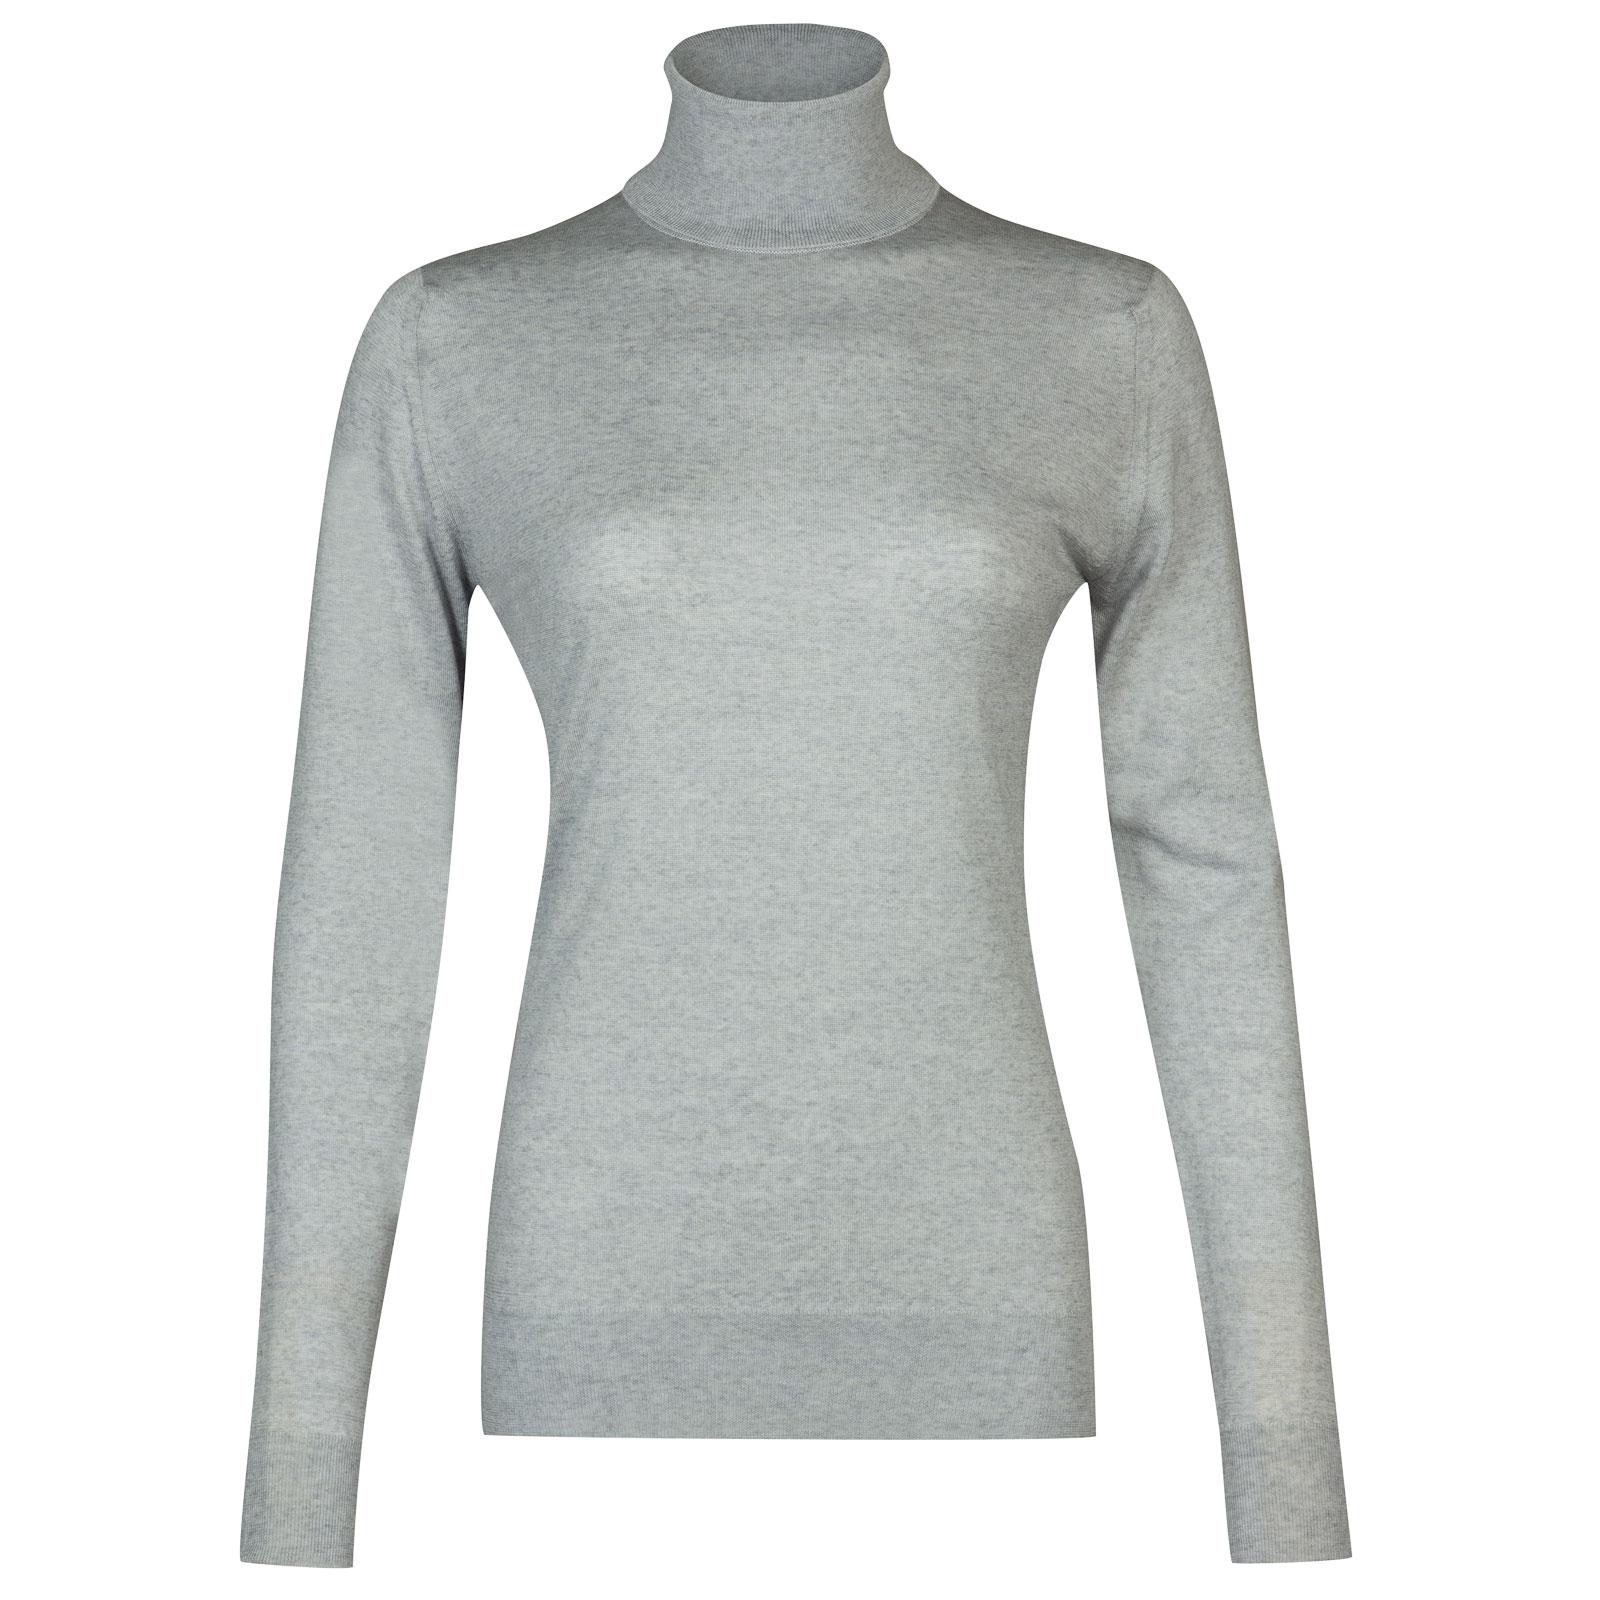 John Smedley Catkin Merino Wool Sweater in Bardot Grey-M